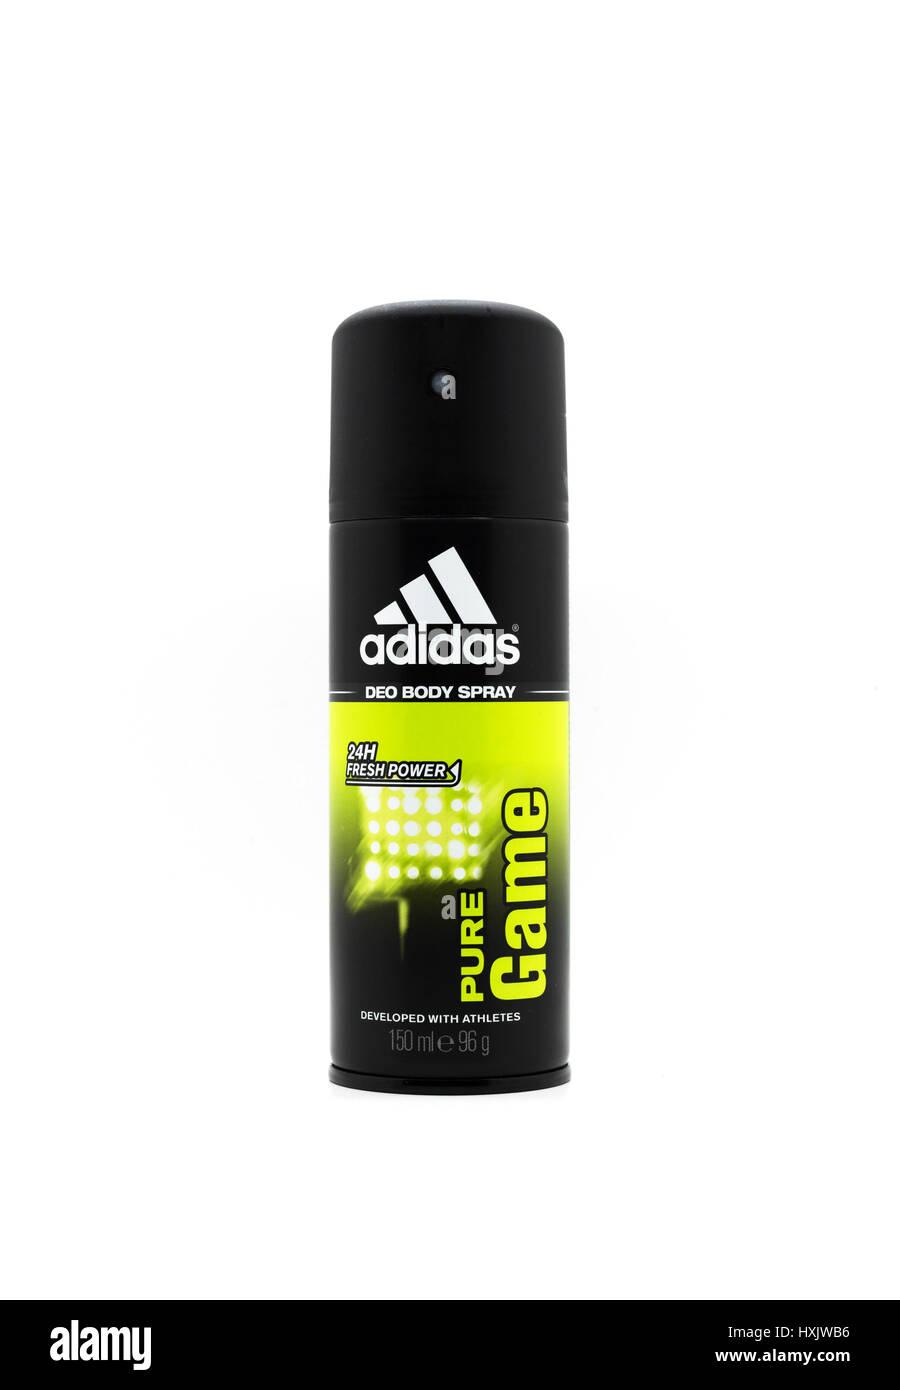 Adidas Deodorant Body Spray Stockbild